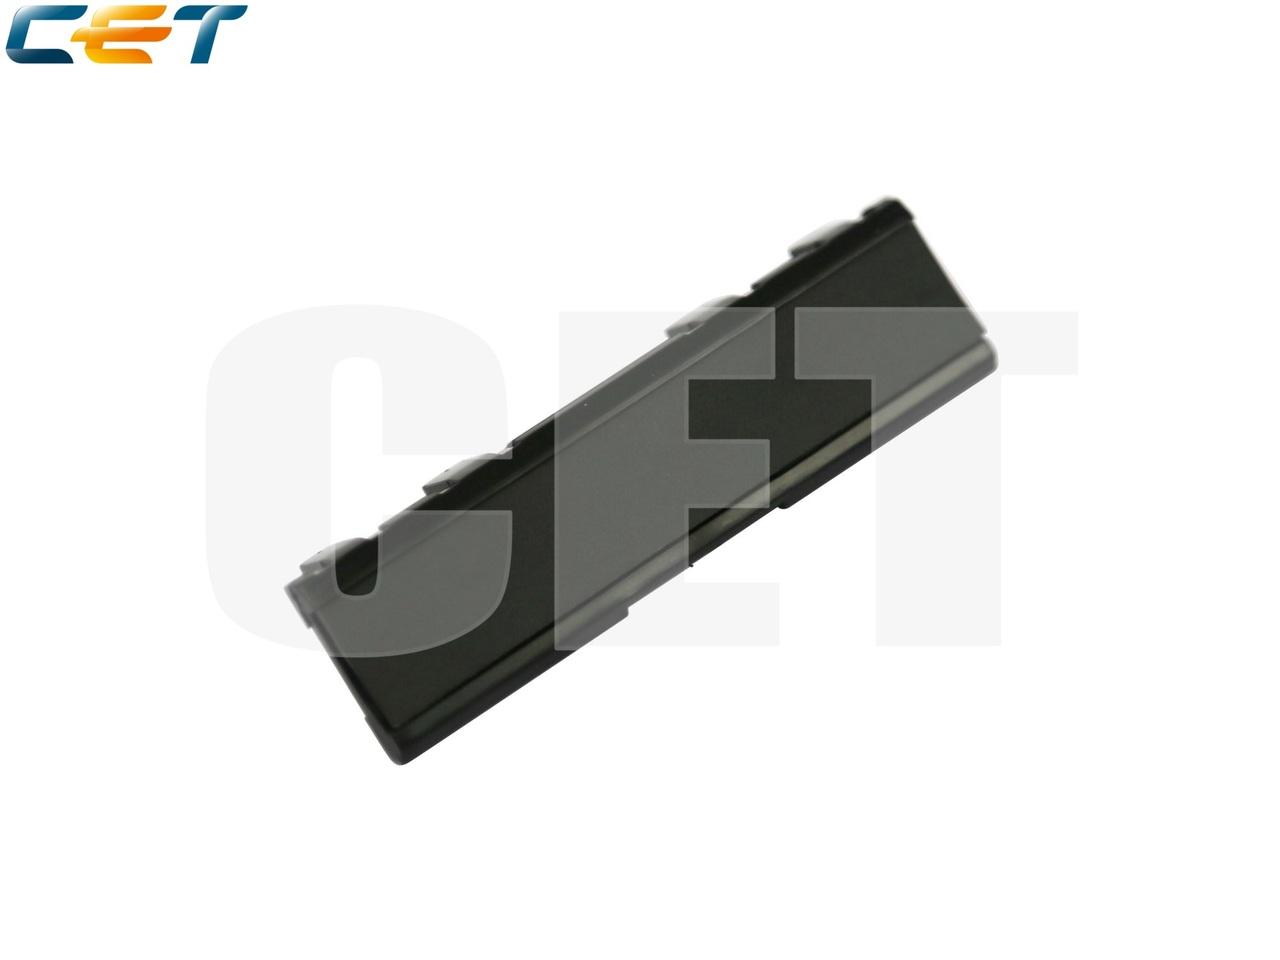 Тормозная площадка 1-го лотка RC2-8575-000 для HP LaserJetEnterprise P3015, M521/M525 (CET), CET2764